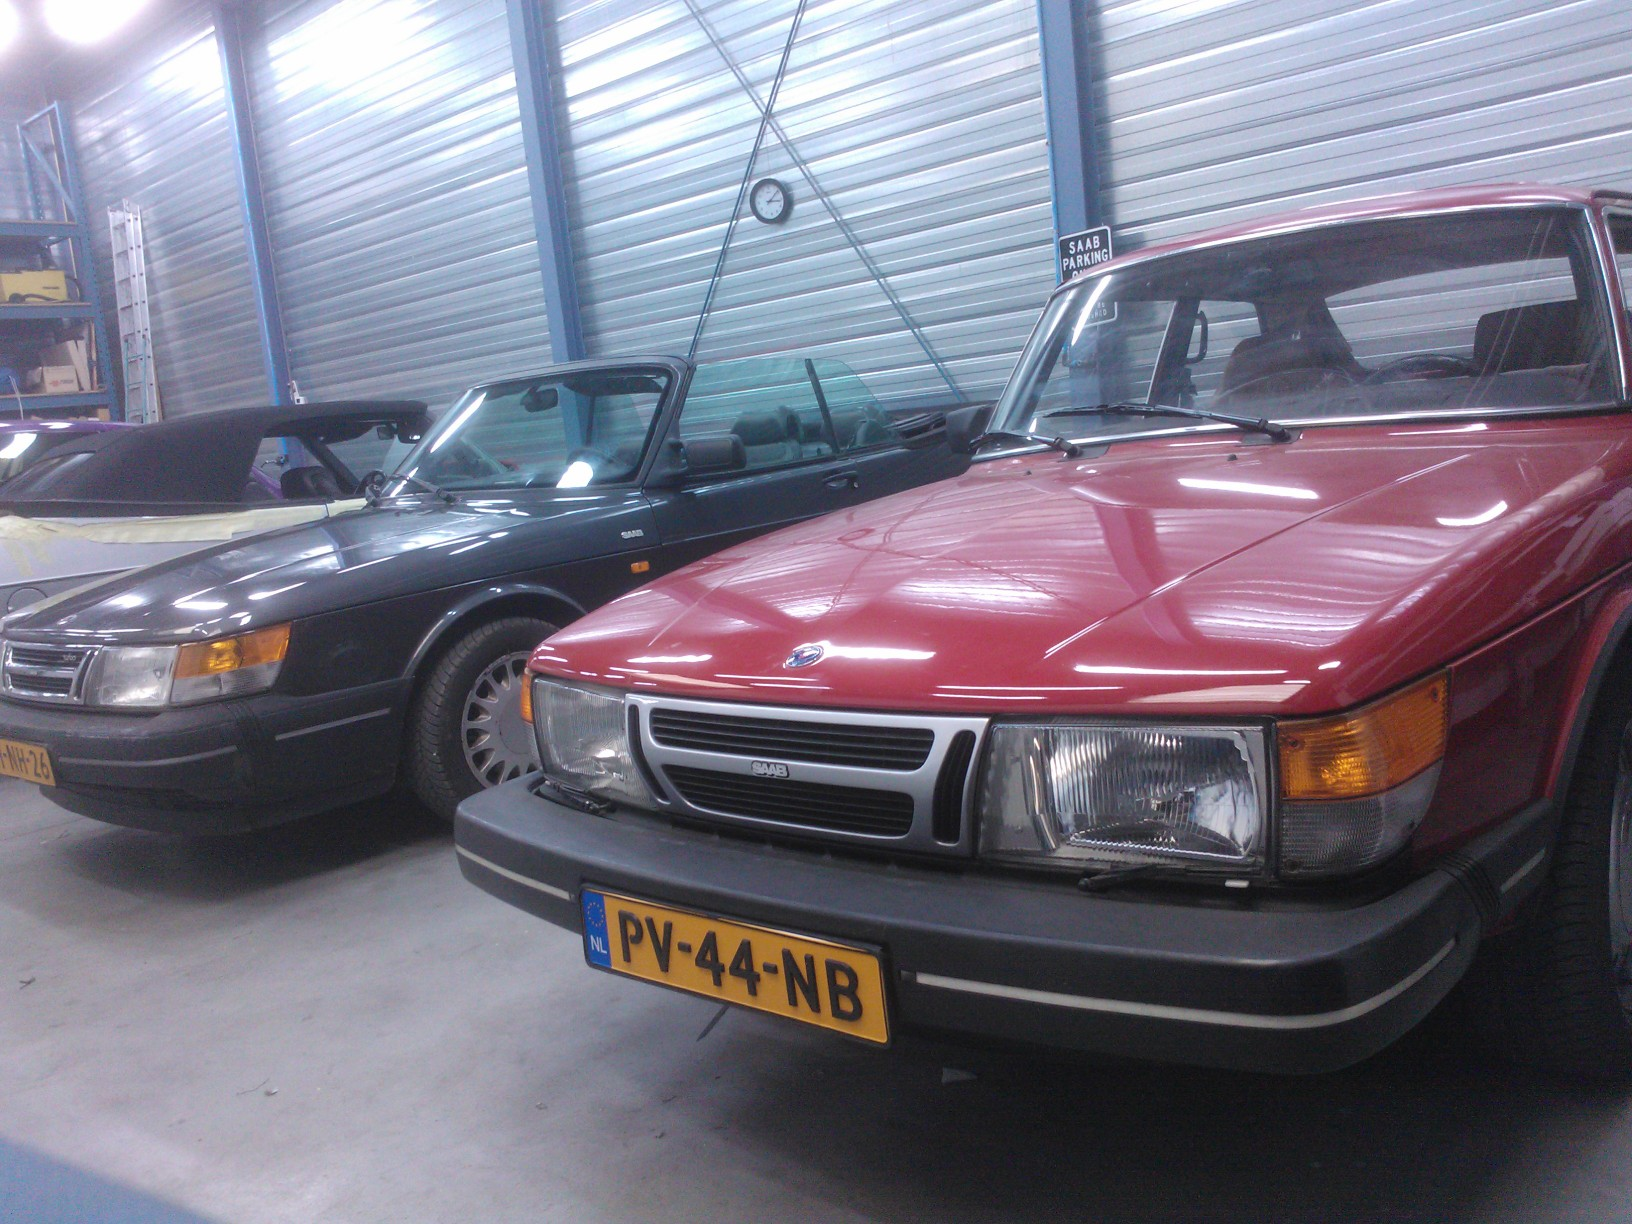 Saab specialist Apeldoorn, bekleding, interieur ǀ Lukkien Autobekleding